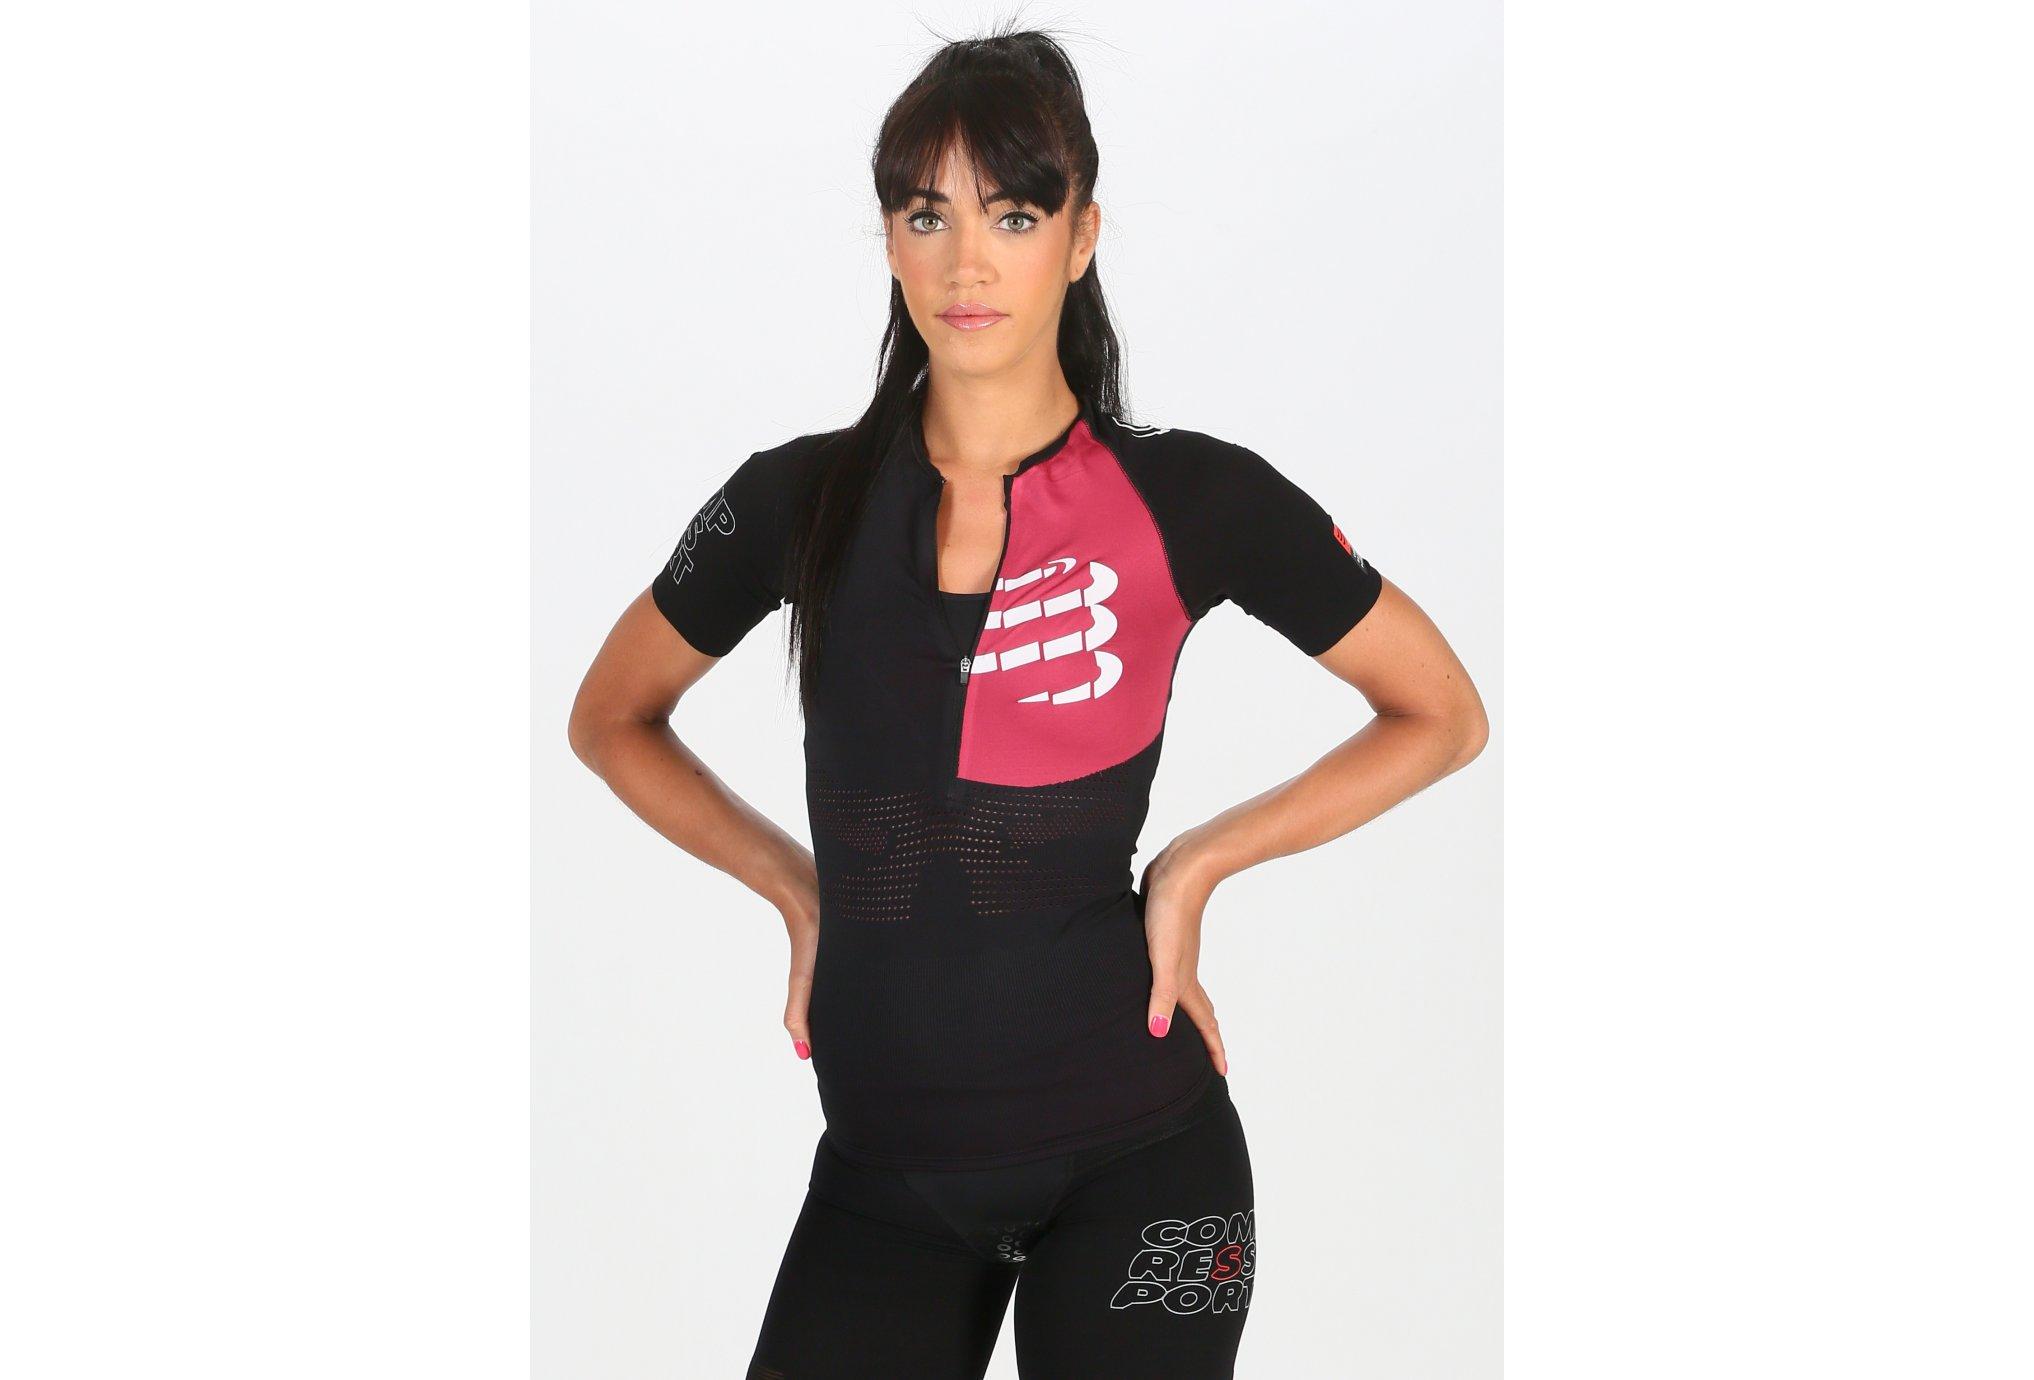 Compressport Postural Aero W Diététique Vêtements femme